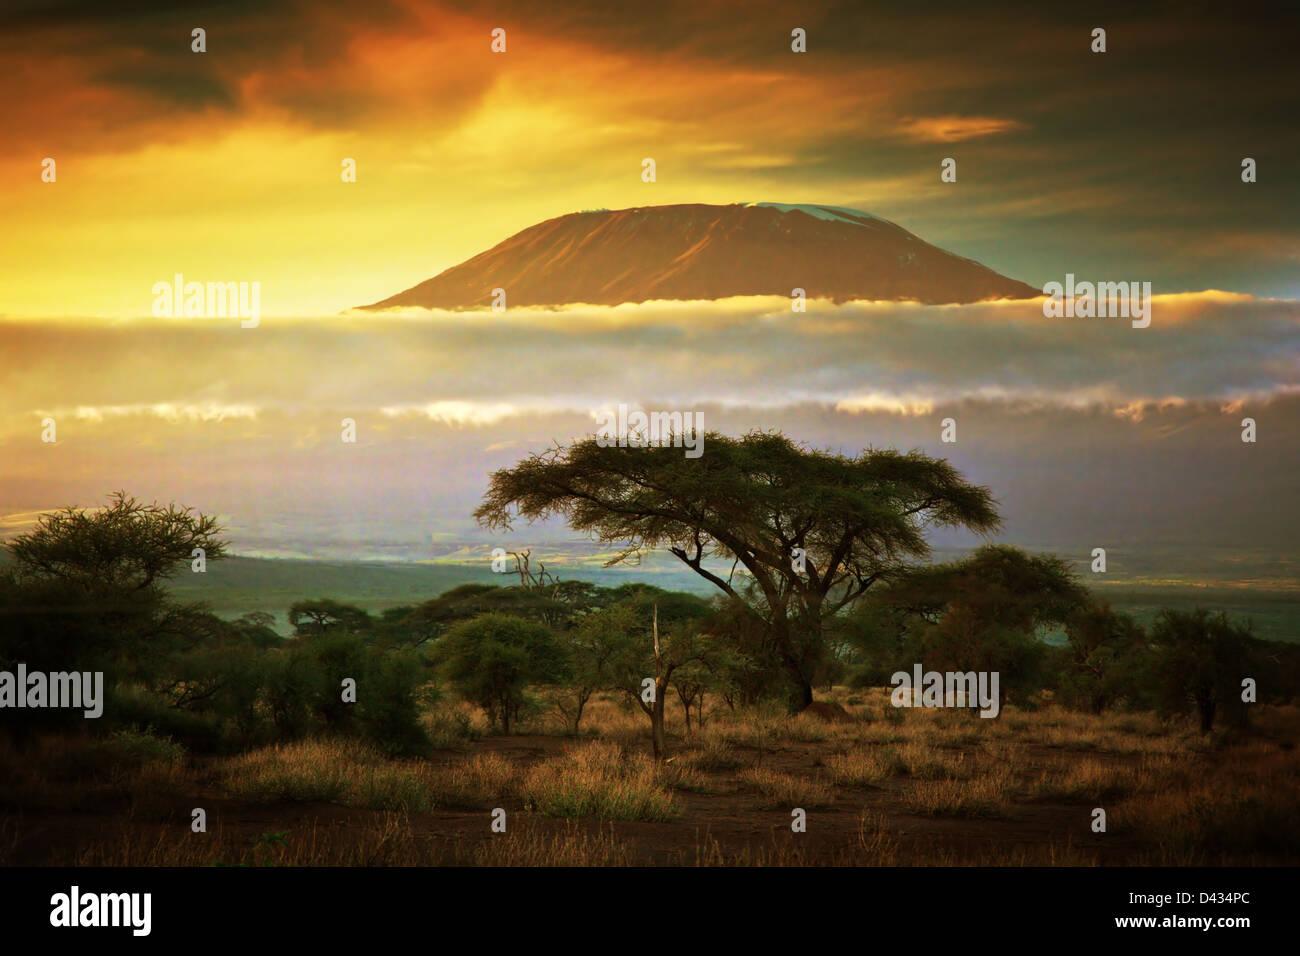 Kilimanjaro, Amboseli, Kenya, Africa - Stock Image